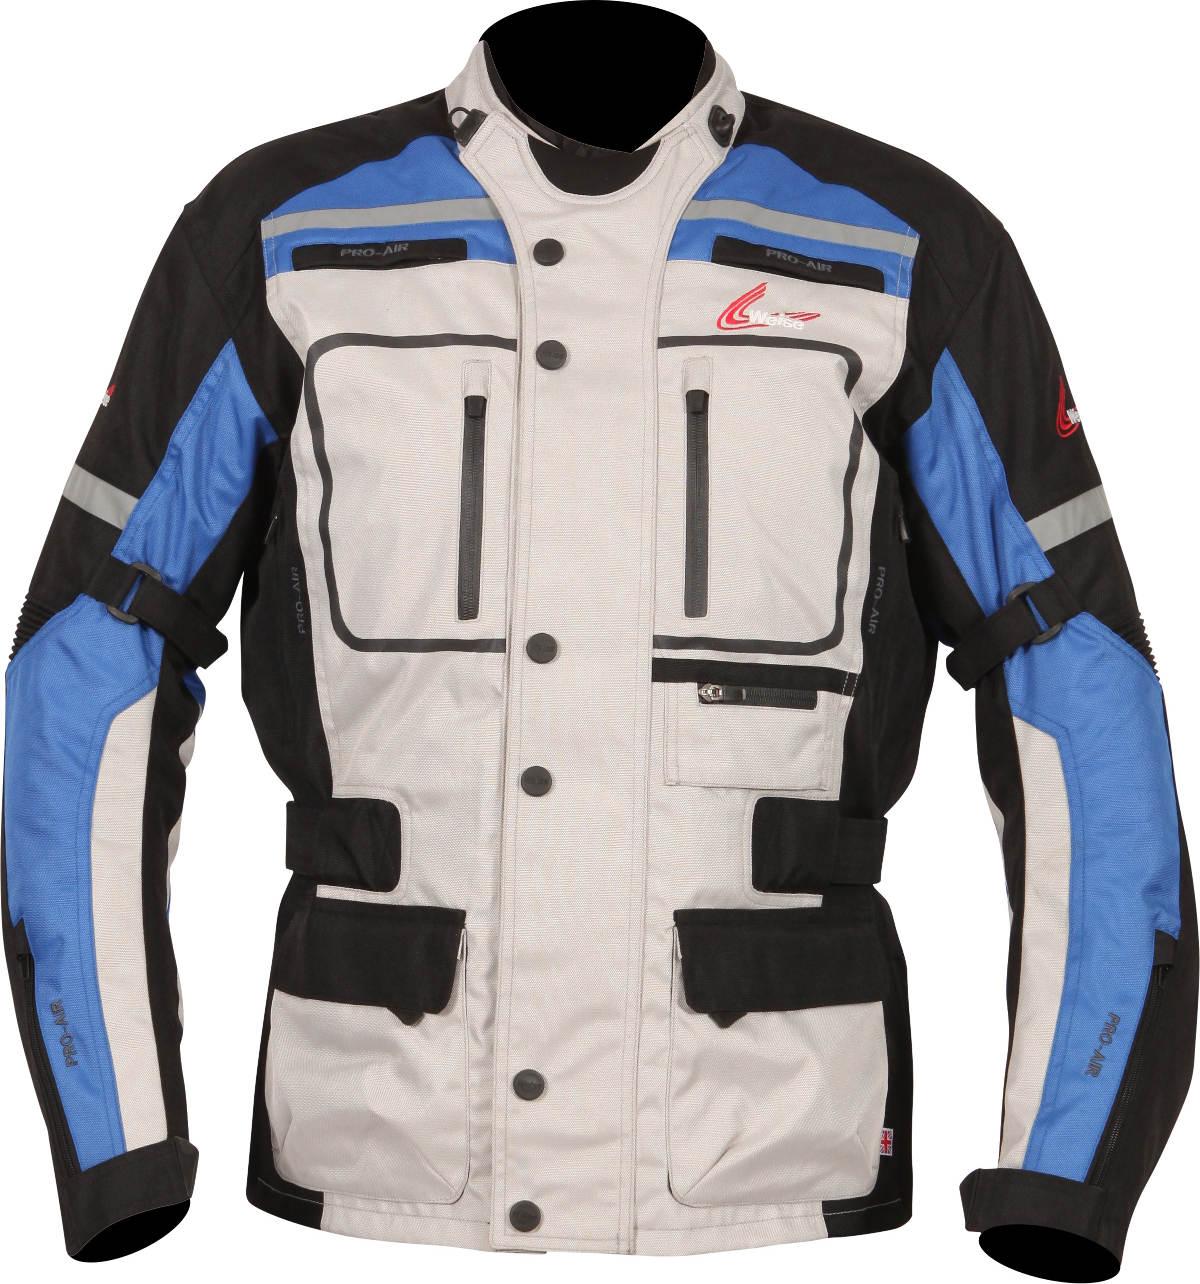 Weise Stuttgart textile Motorcycle Jacket Stone Blue